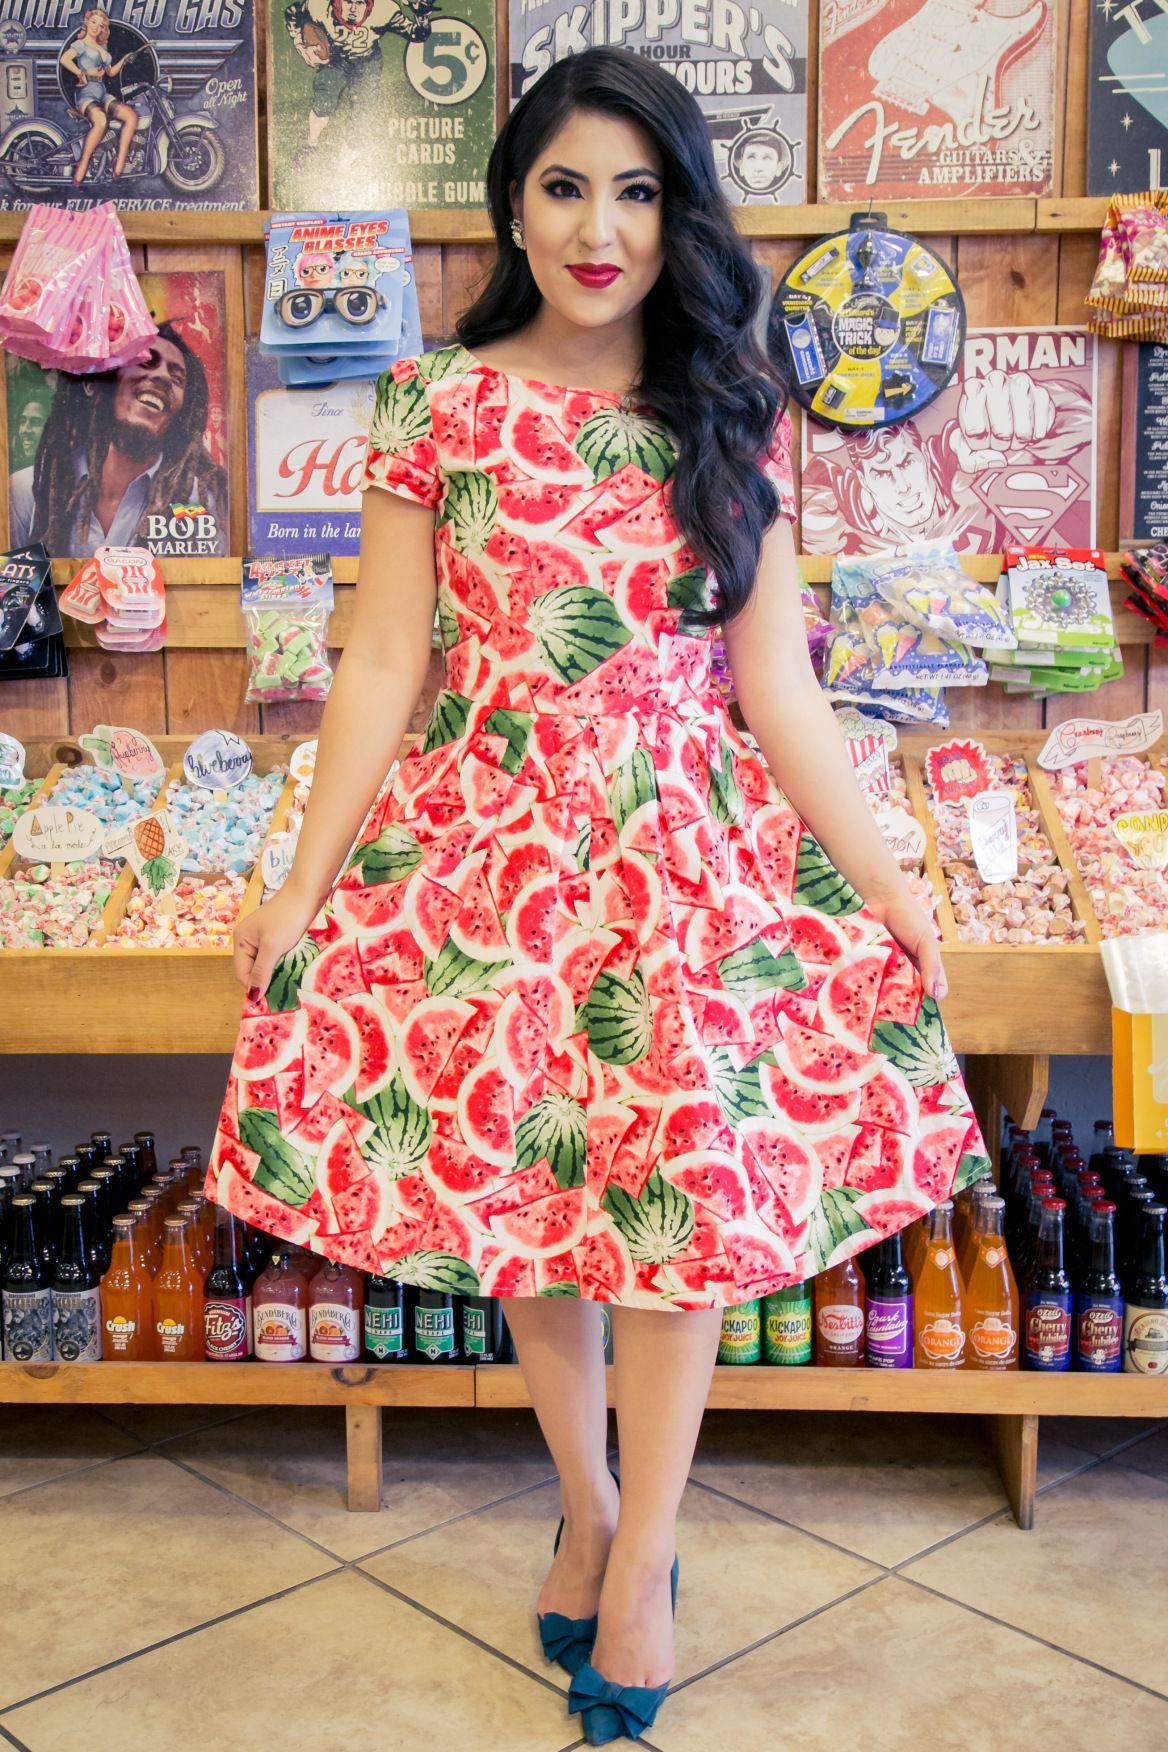 Modest Vintage Dress Summer Outfit Ideas Retro Photoshoot